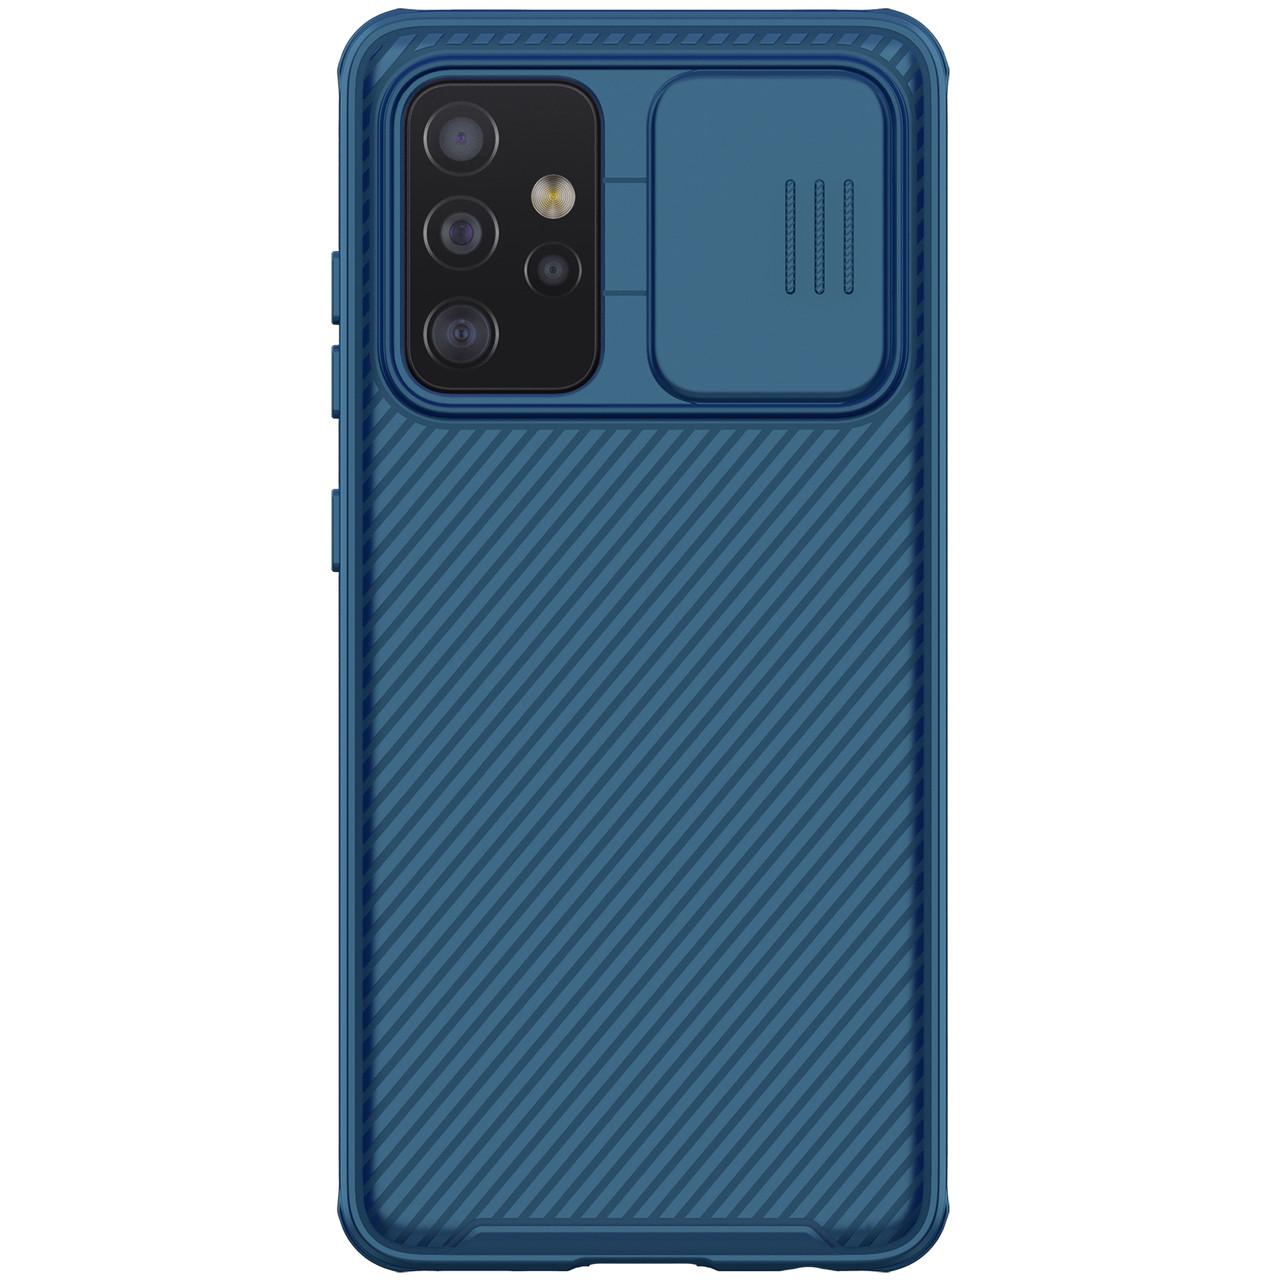 Защитный чехол Nillkin для Samsung Galaxy A52 4G/5G (CamShield Pro Case) Blue с защитой камеры